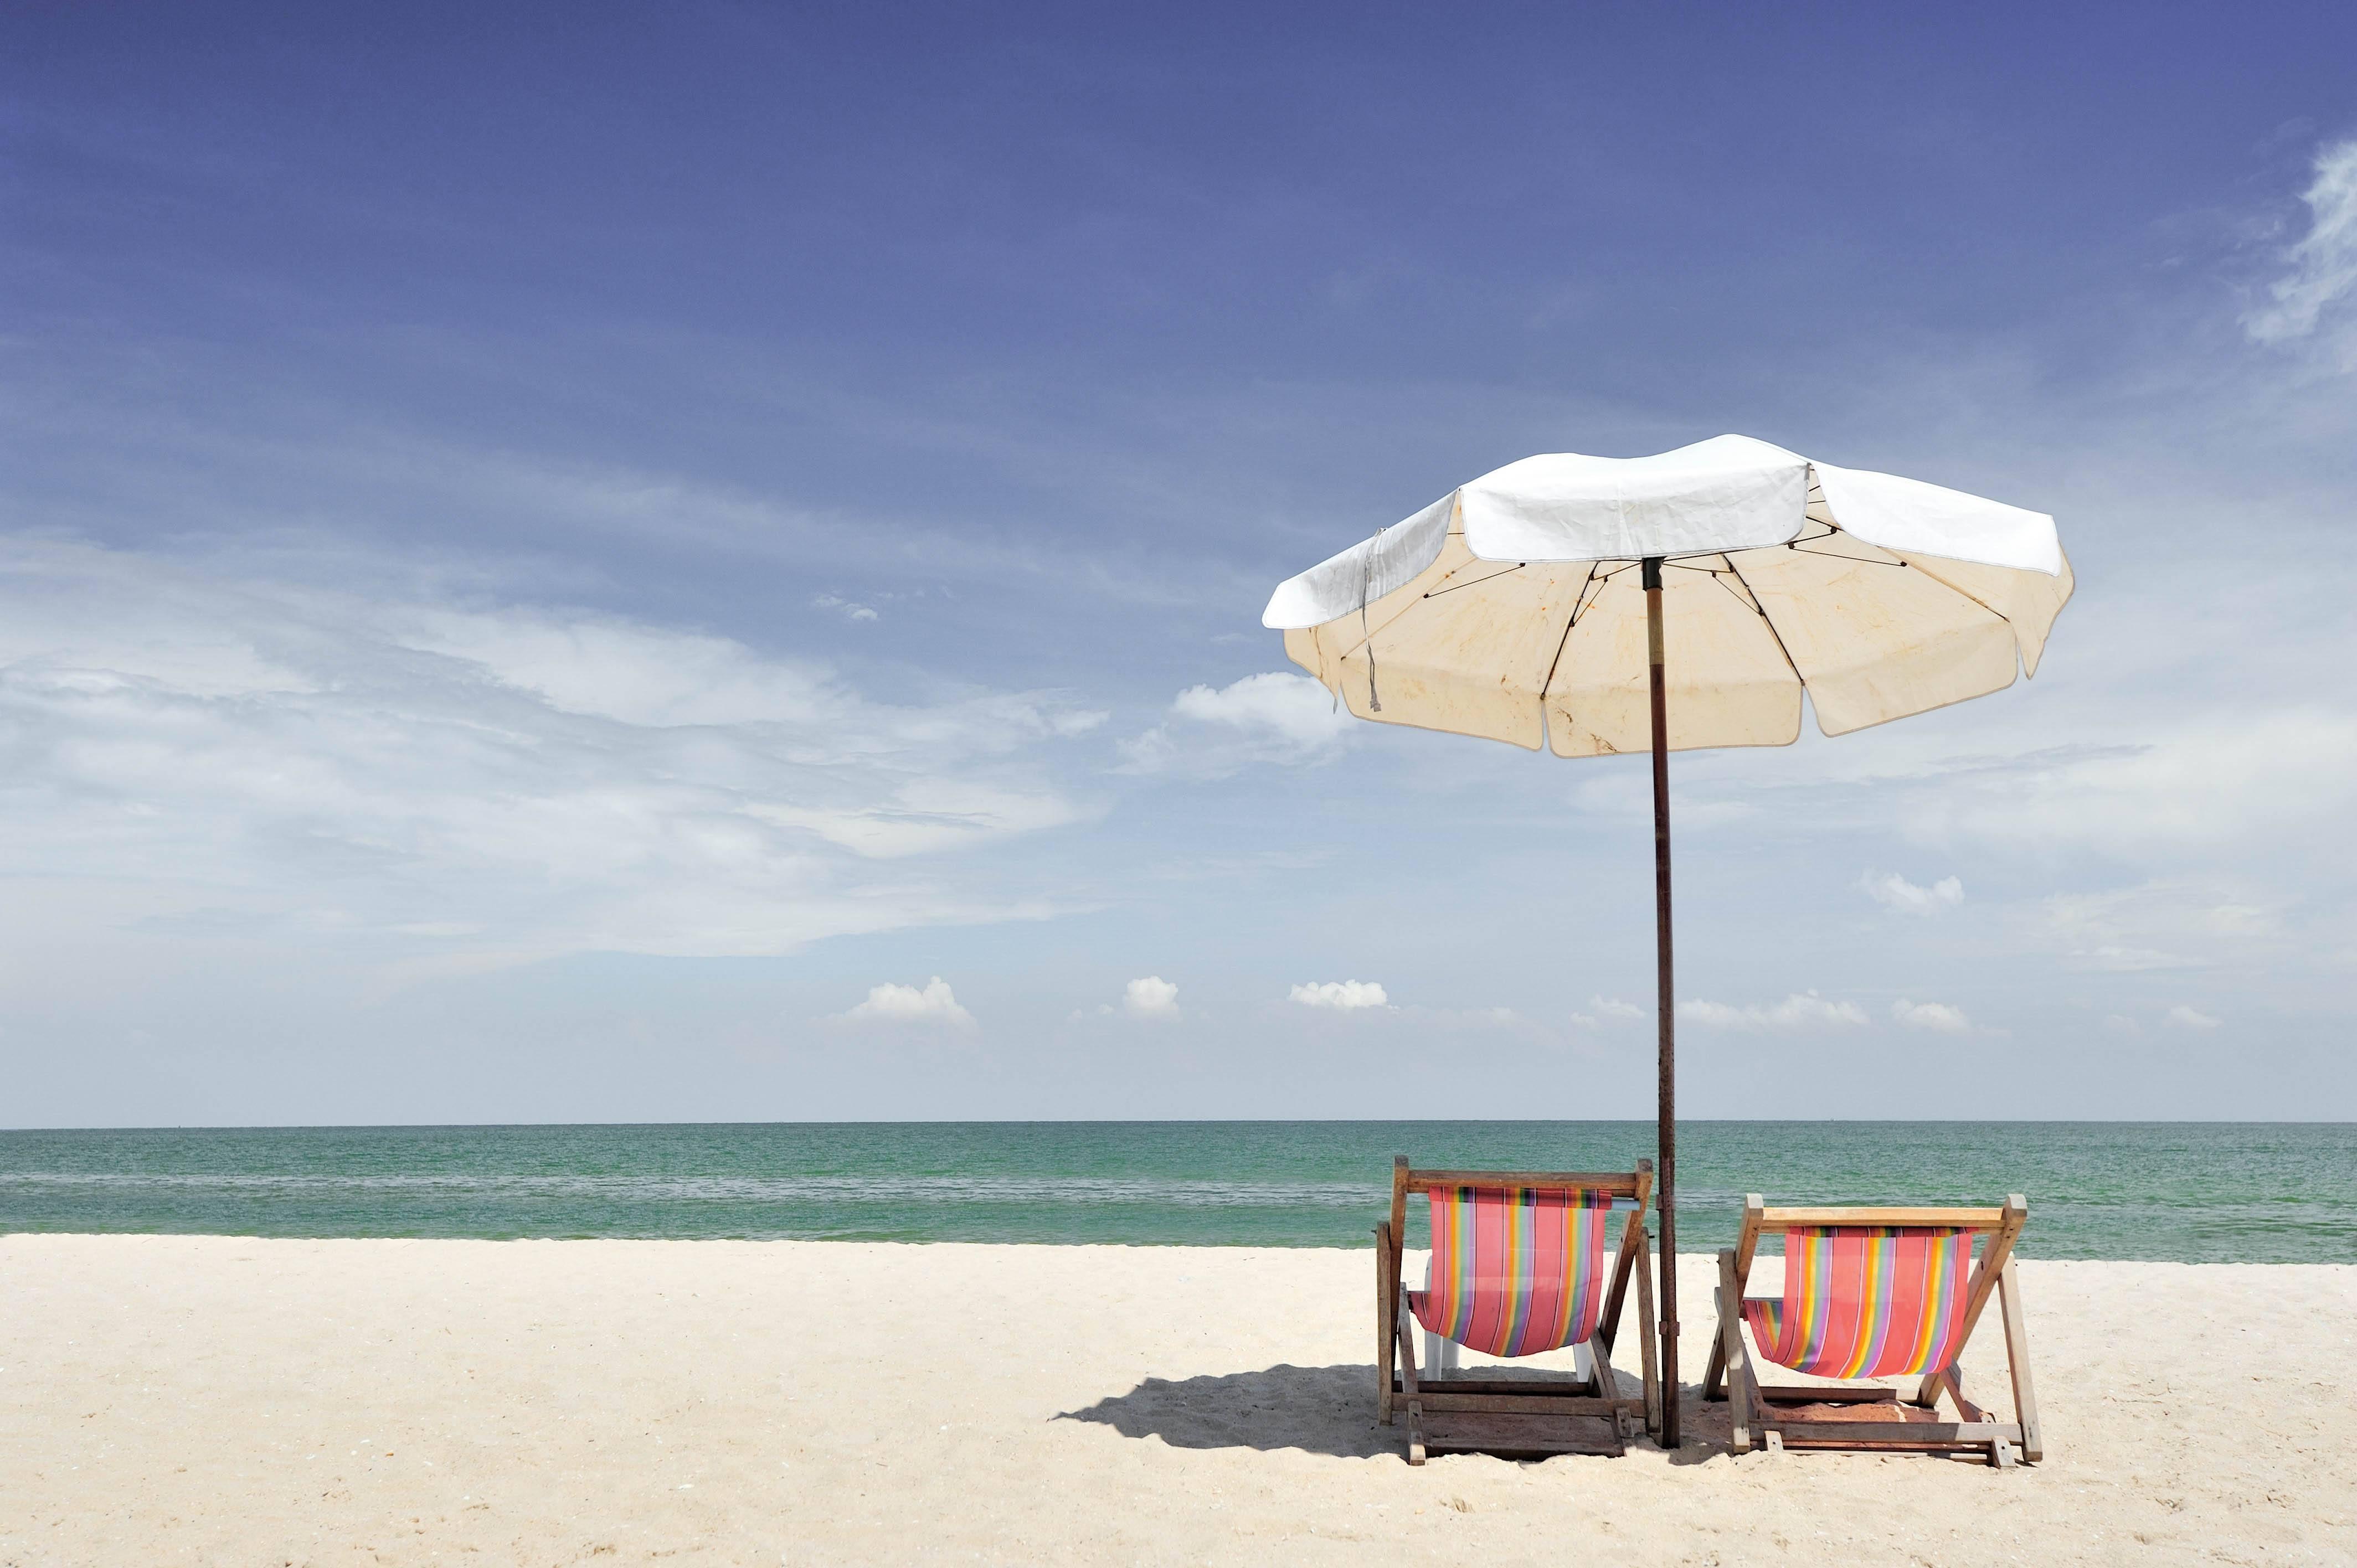 Free Lightroom Preset Sunny Beach - Download Now!